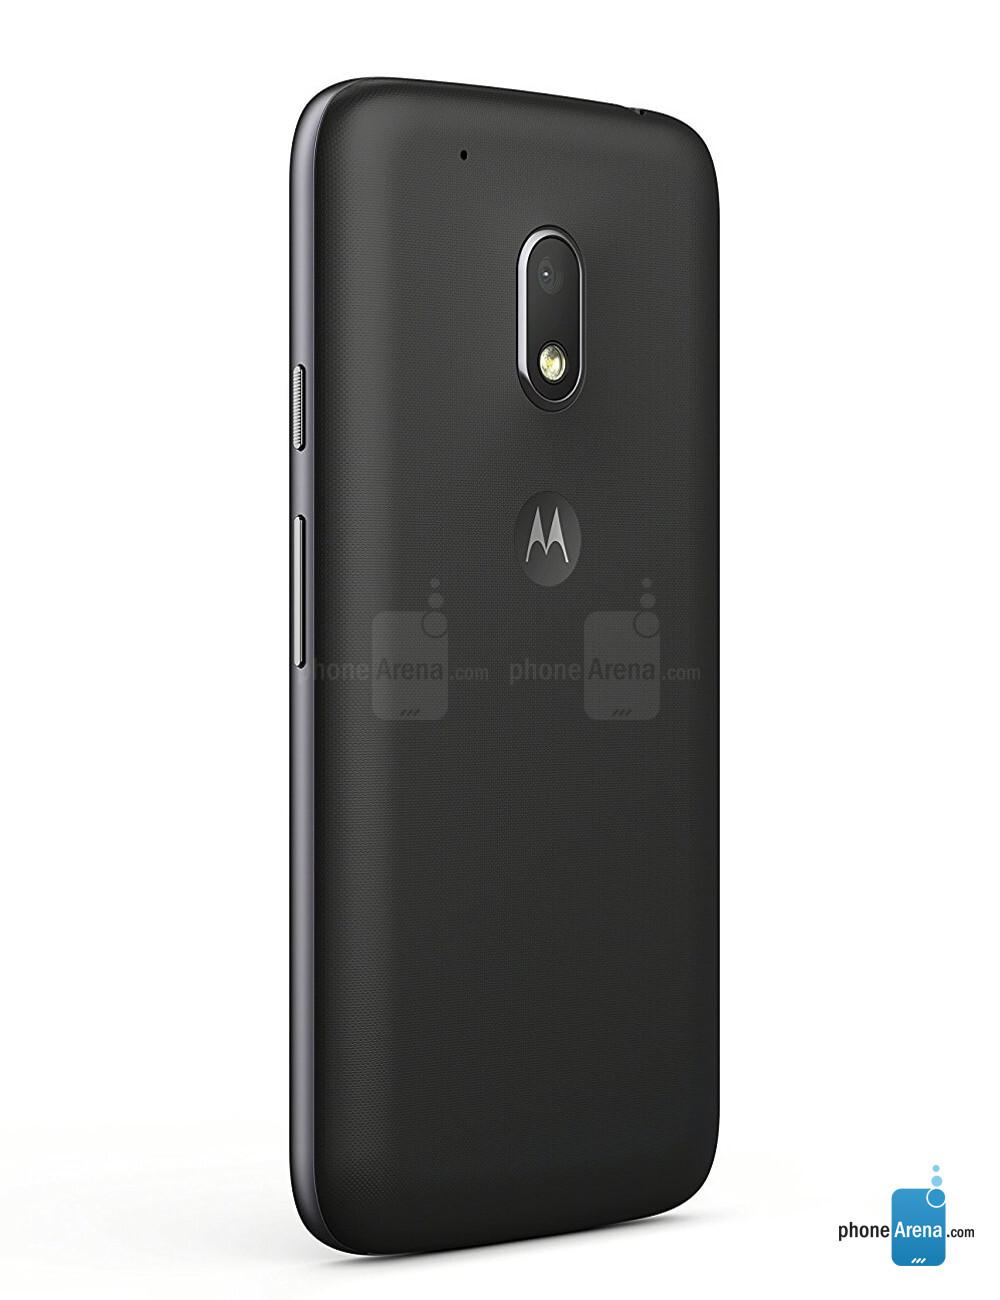 Motorola Moto G4 Play specs